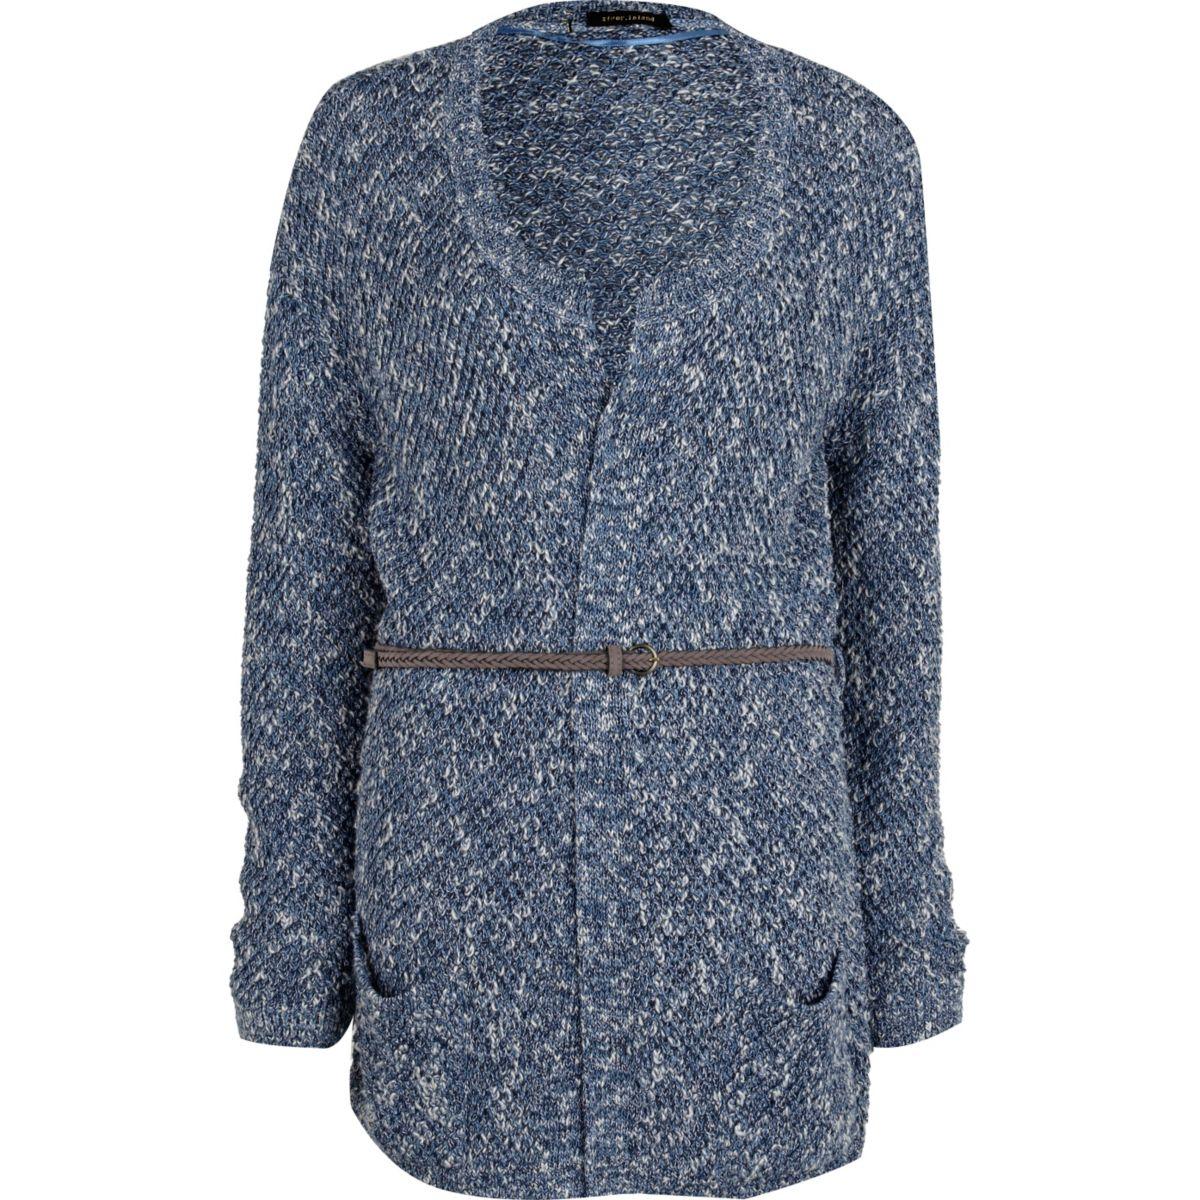 Blue tuck stitch belted cardigan